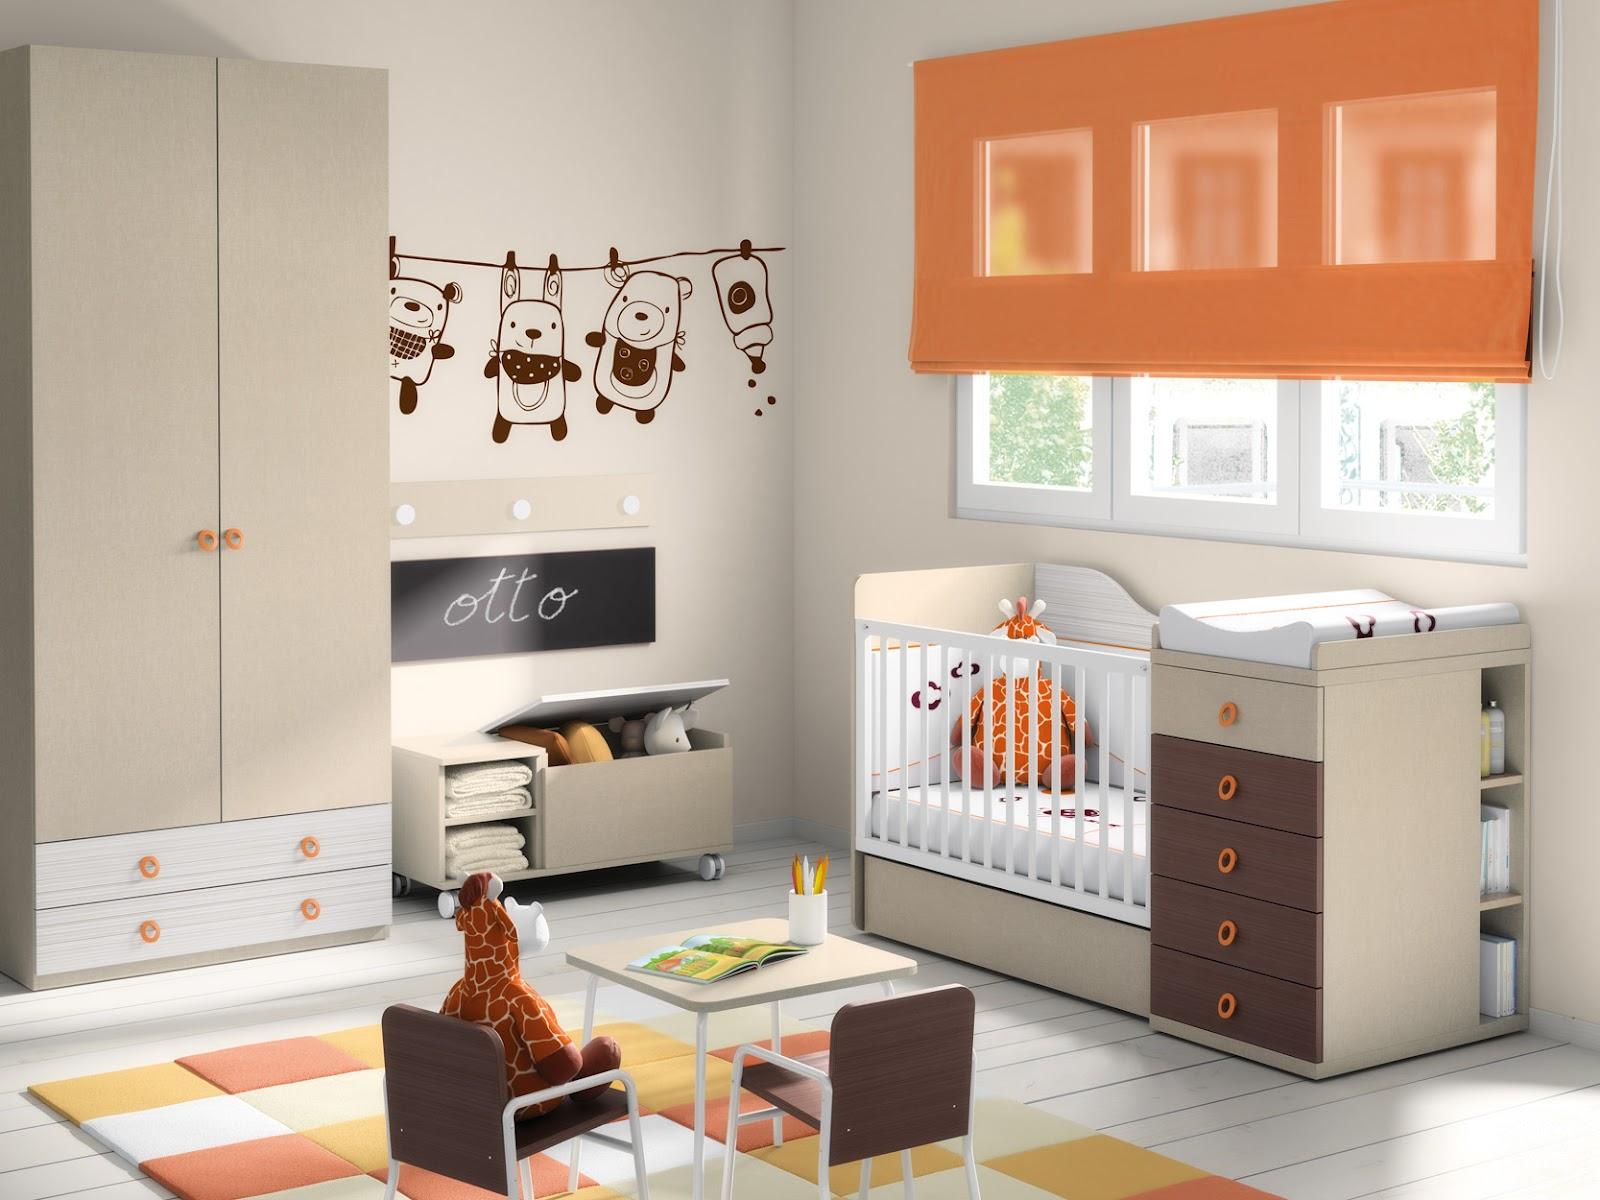 Lettini per bambini prezzi : lettini per bambini chicco prezzi ...